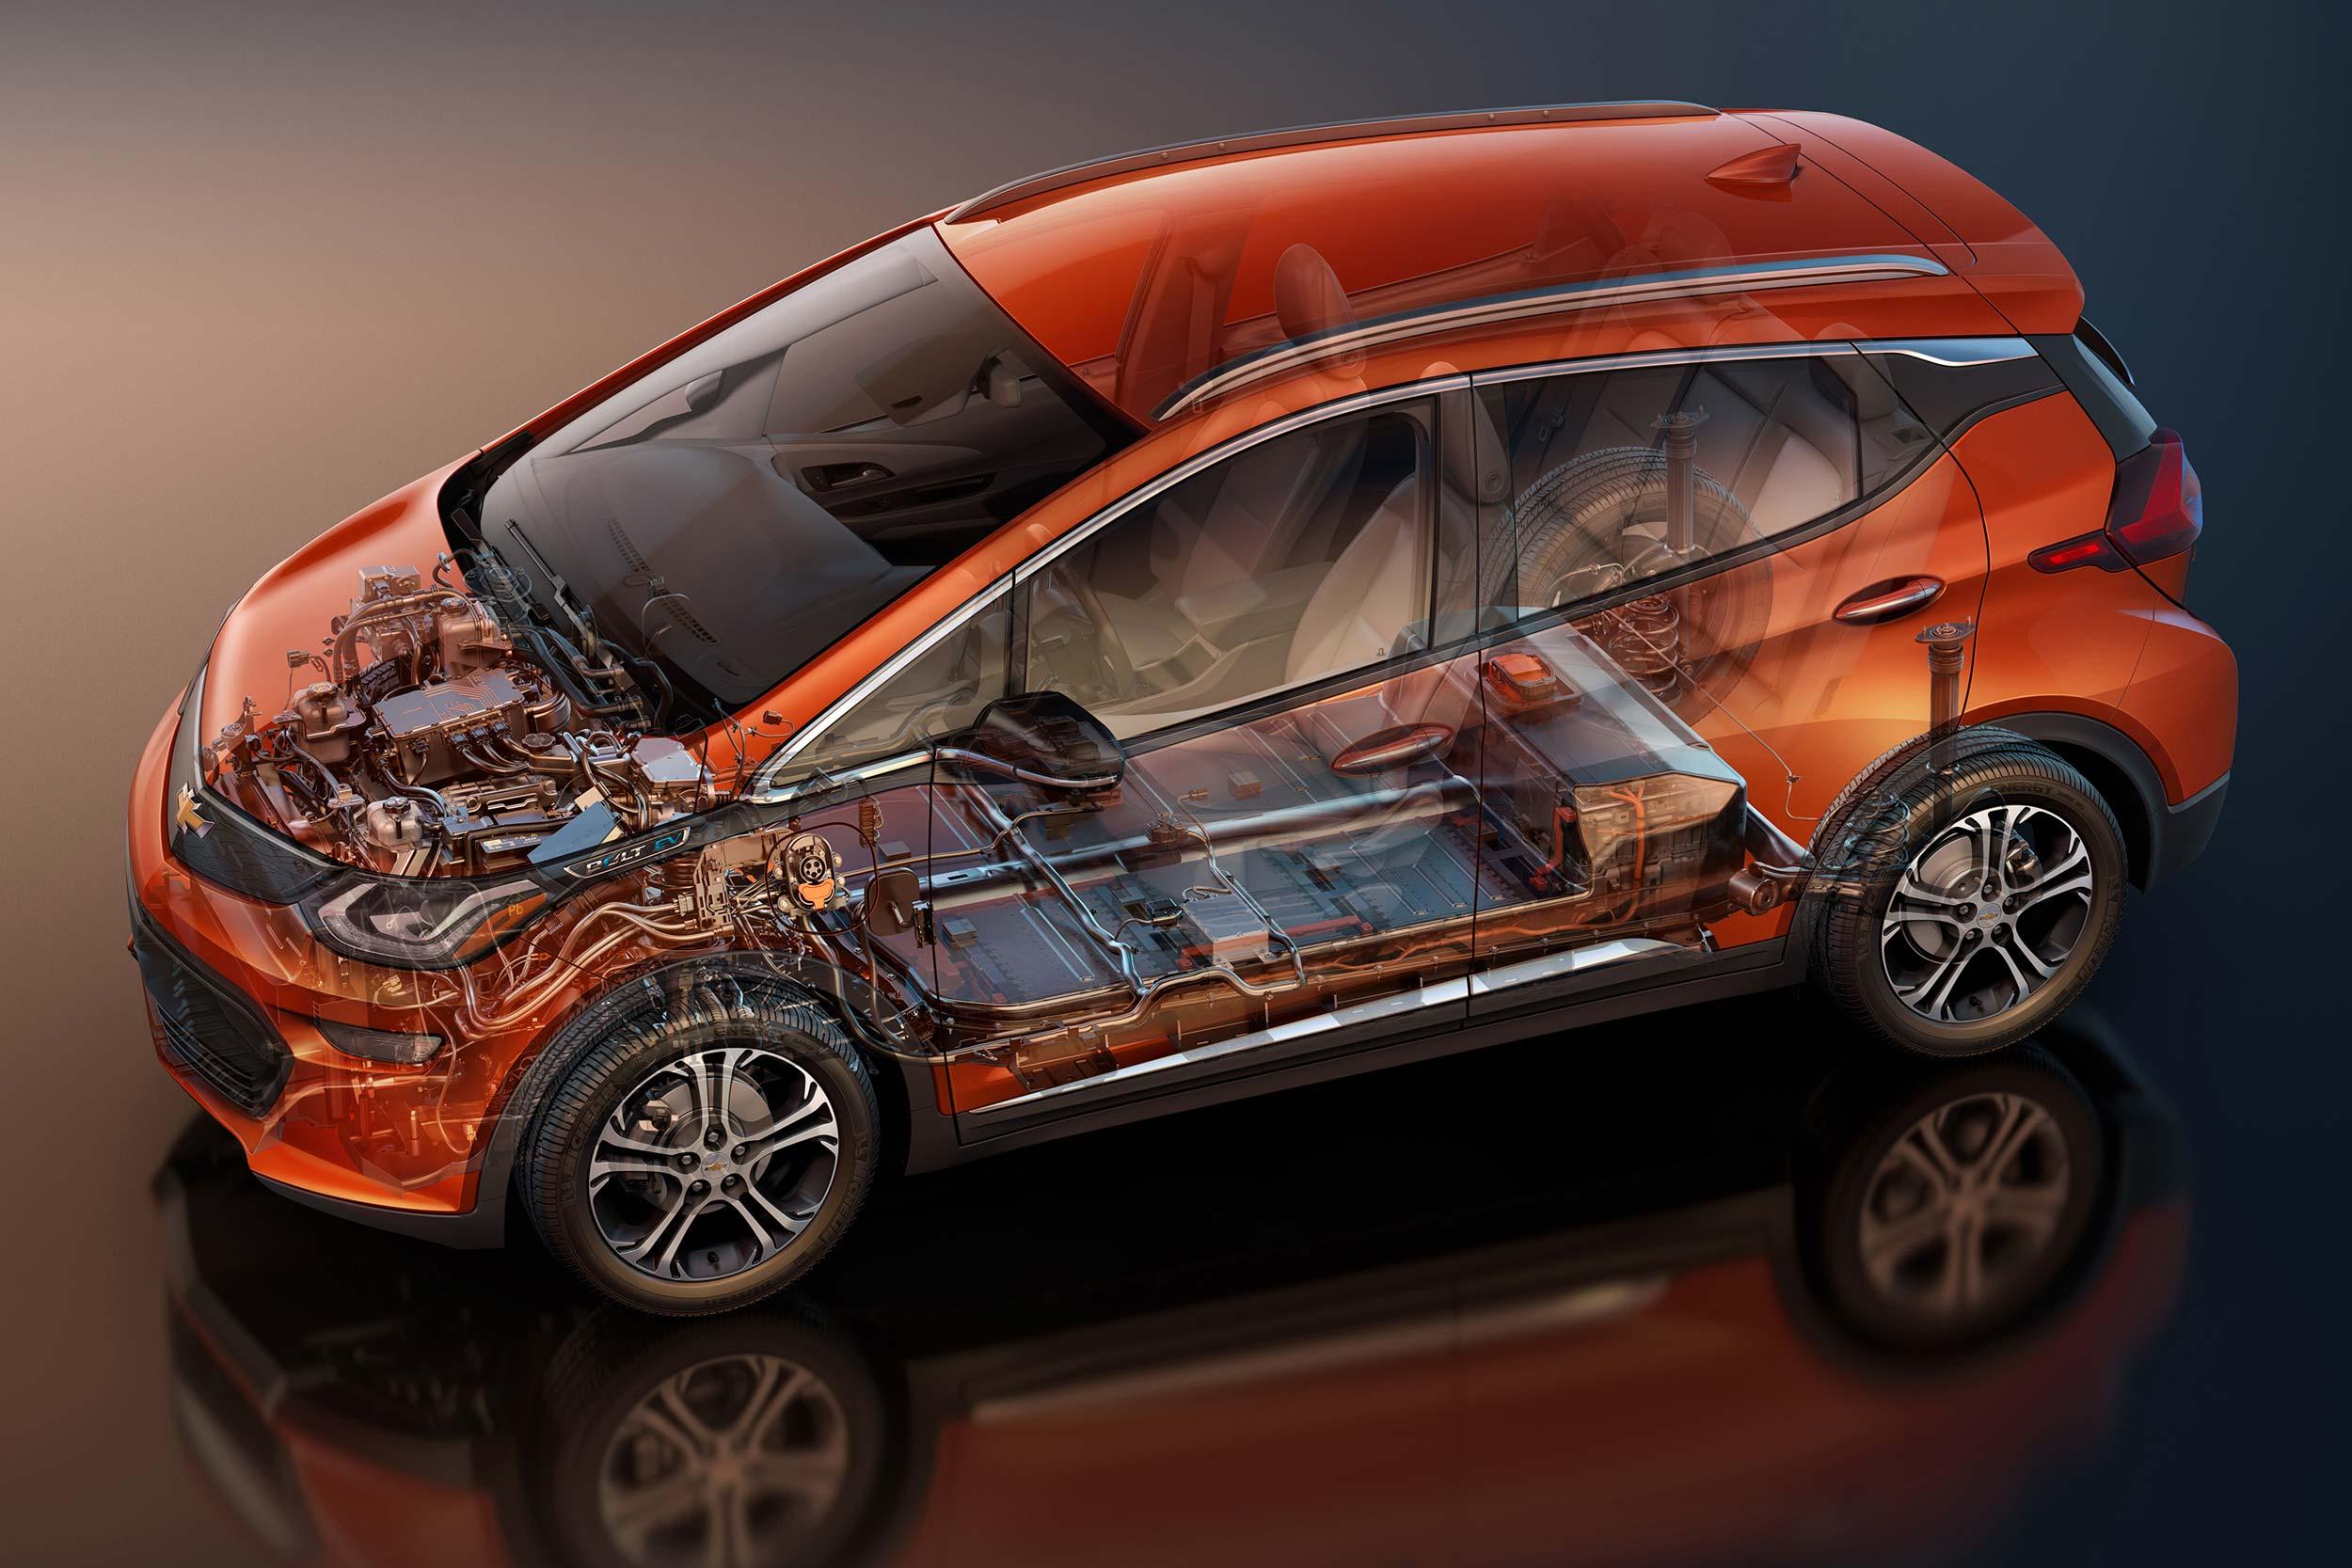 2017 Chevrolet Volt battery system